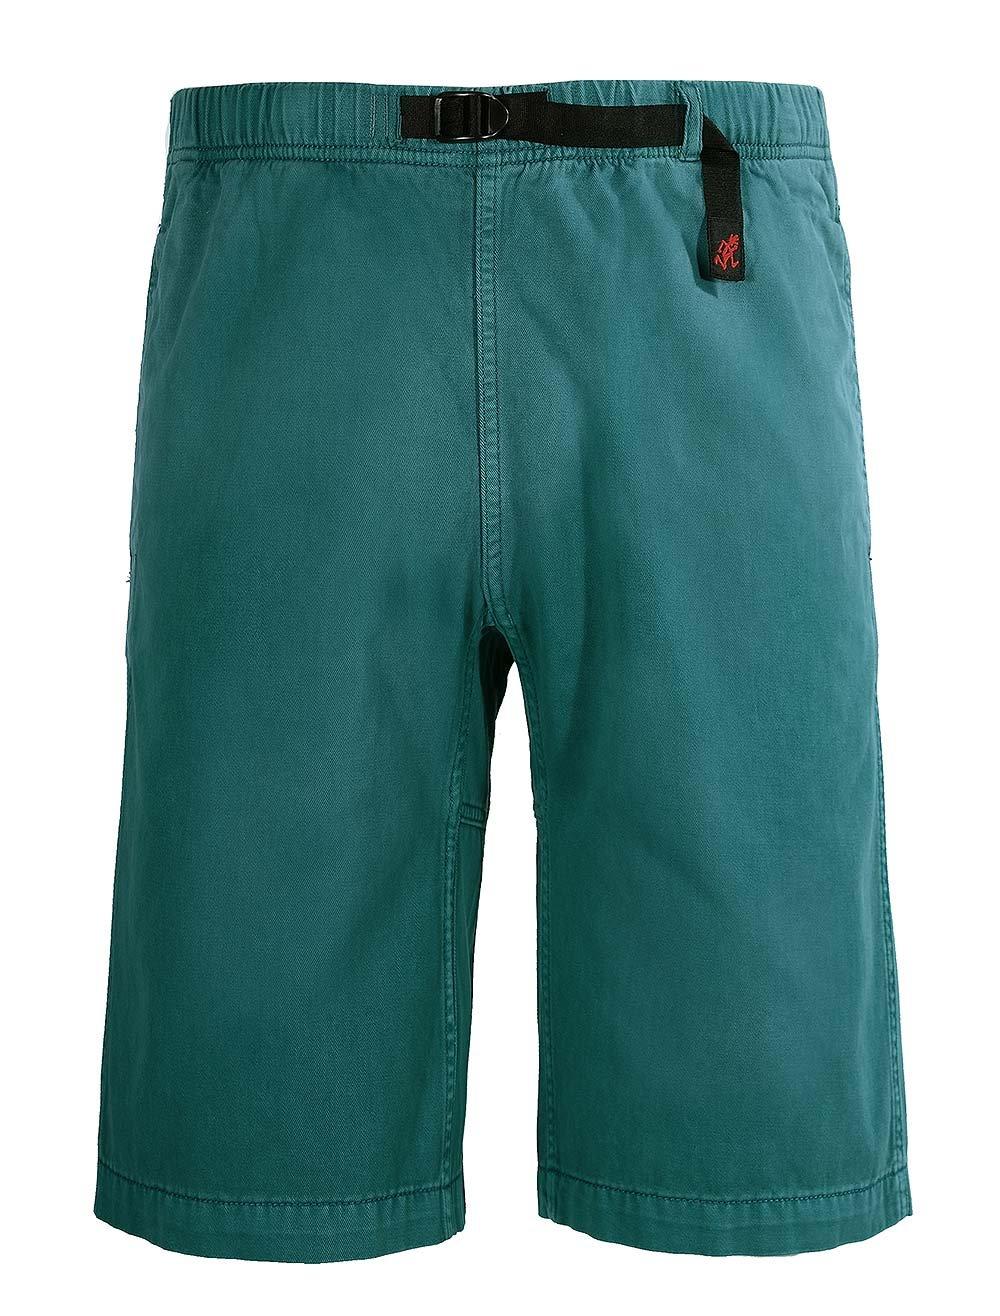 Gramicci Men's Original G Shorts, Harbor Blue, Large